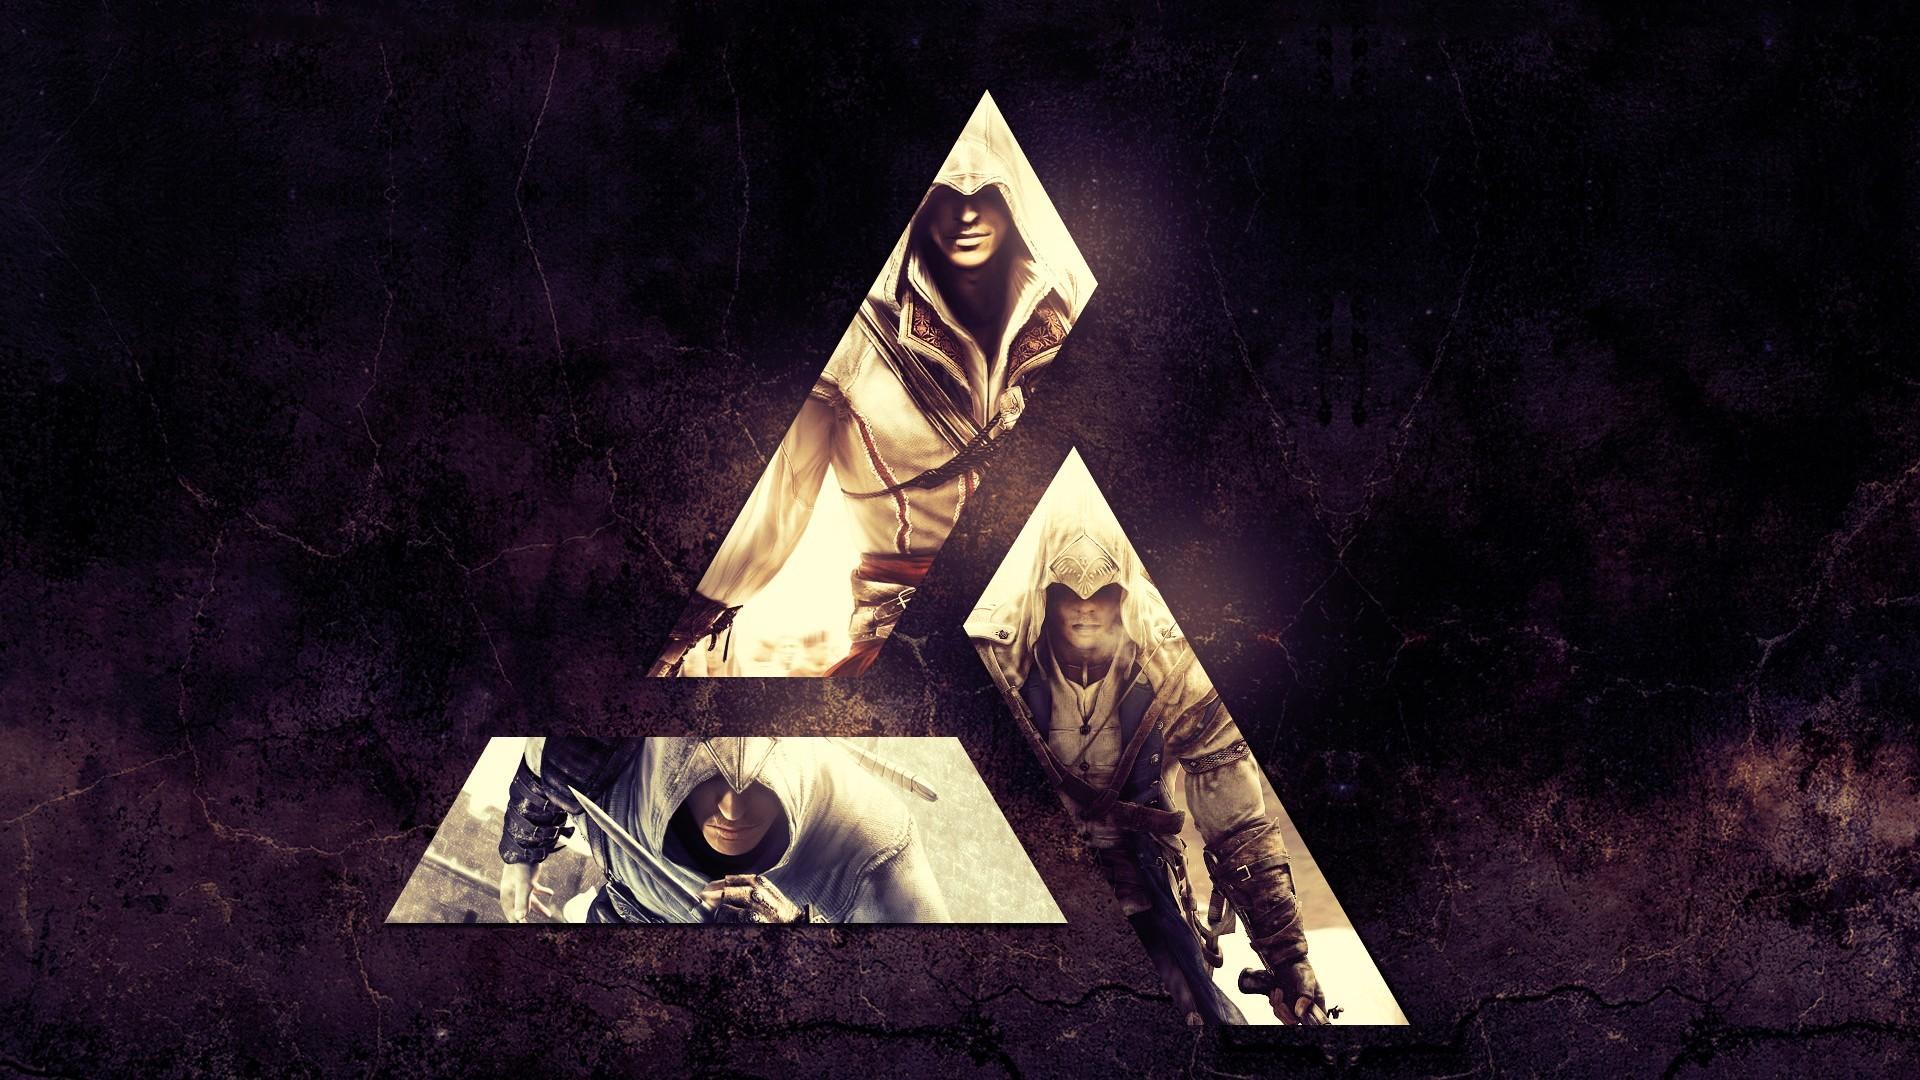 2048x1152 Wallpapers Assassins Creed Logo Emblem Fire Games Flame